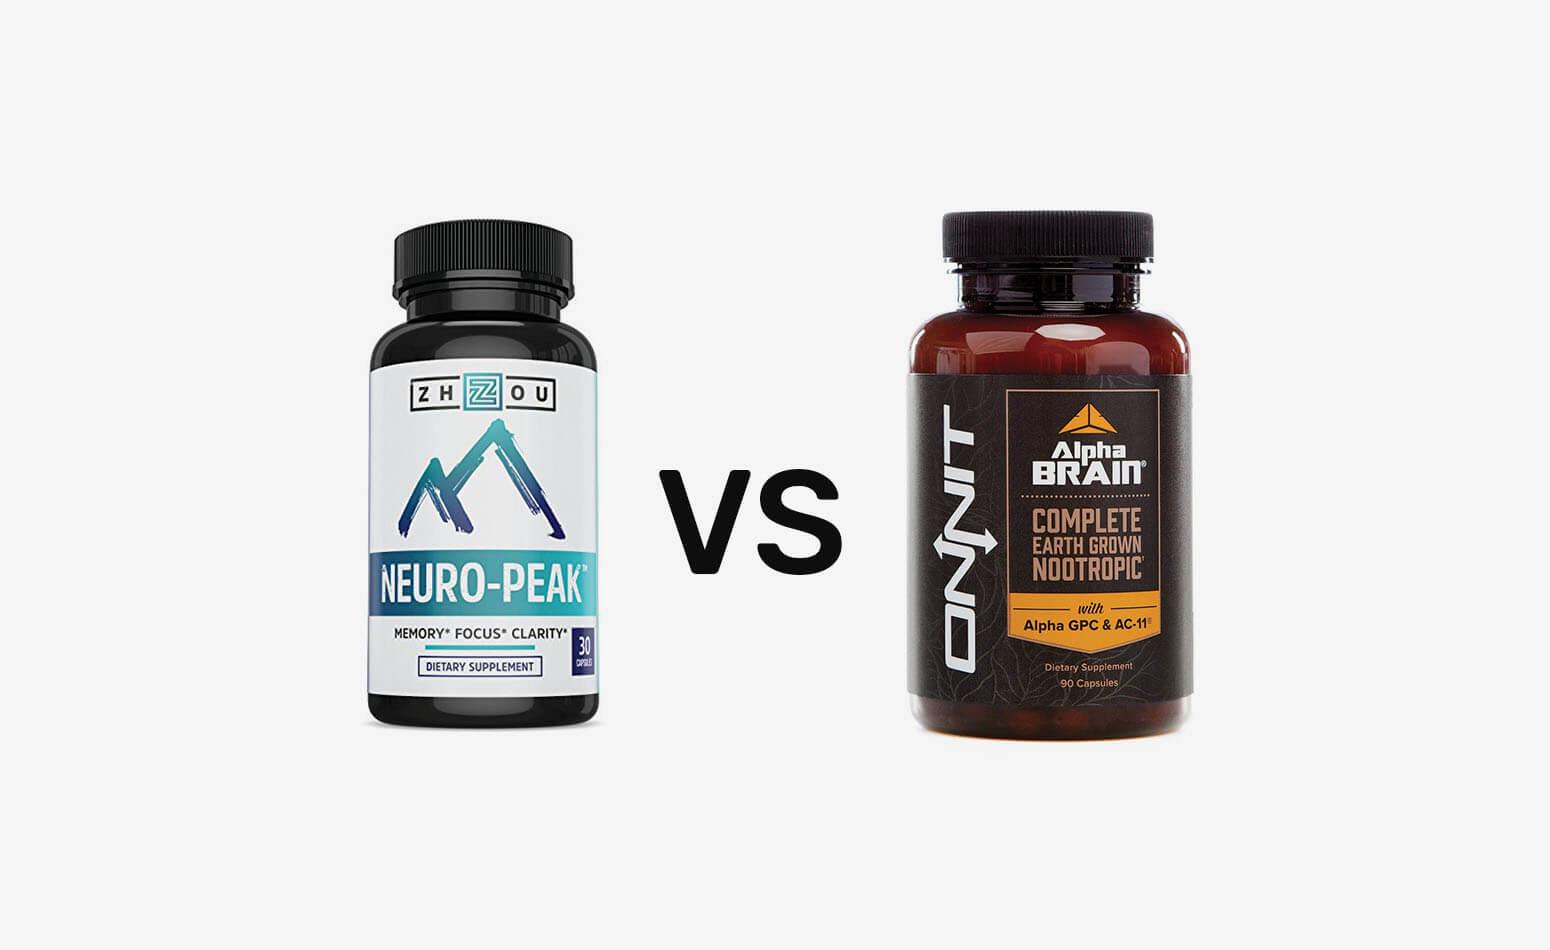 Neuro Peak vs Alpha Brain: An Unbiased Look At Both